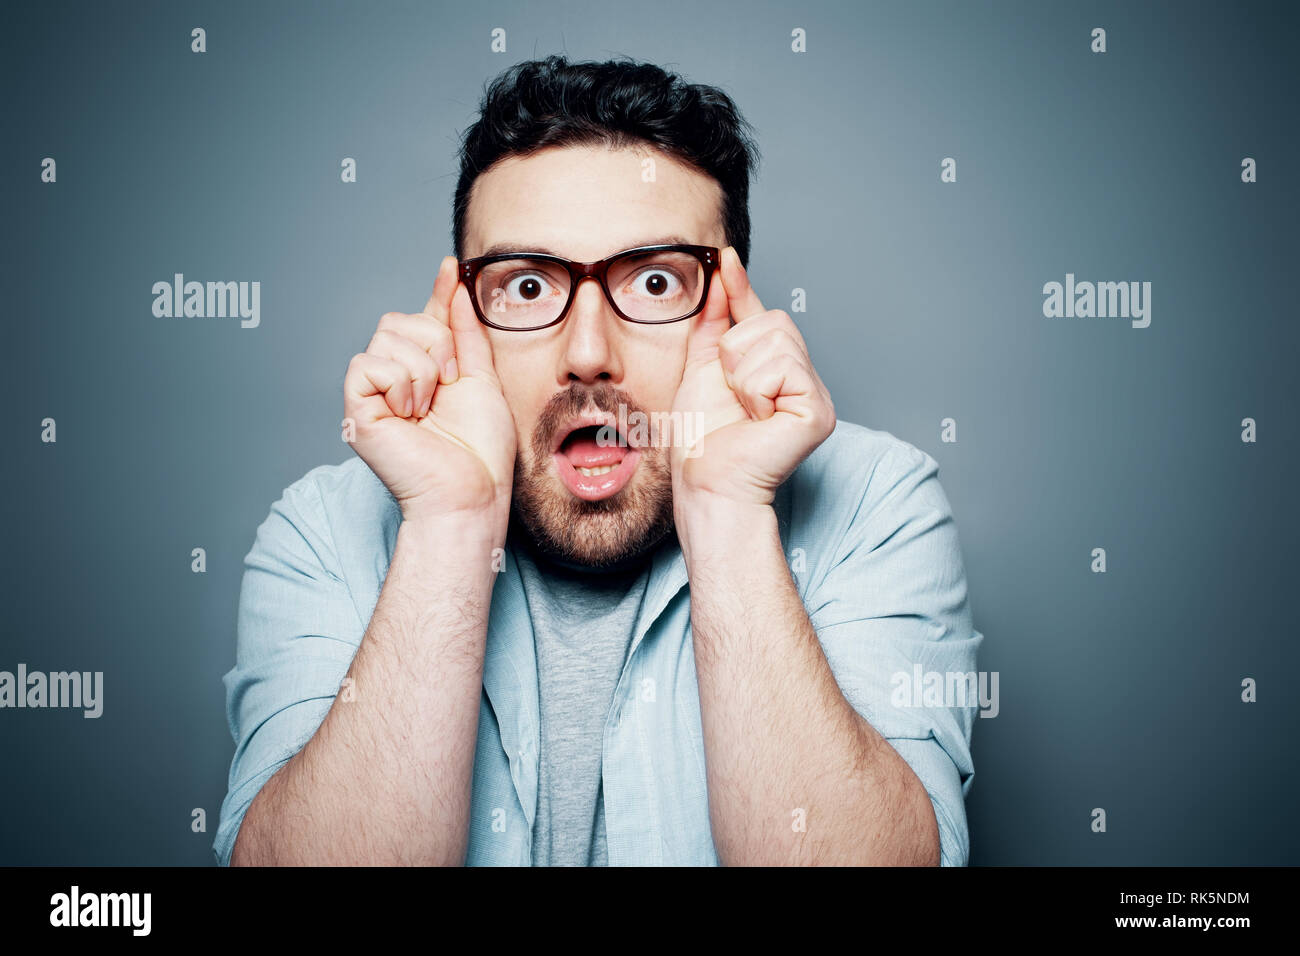 Surprised man touching glasses feeling shocked - Stock Image